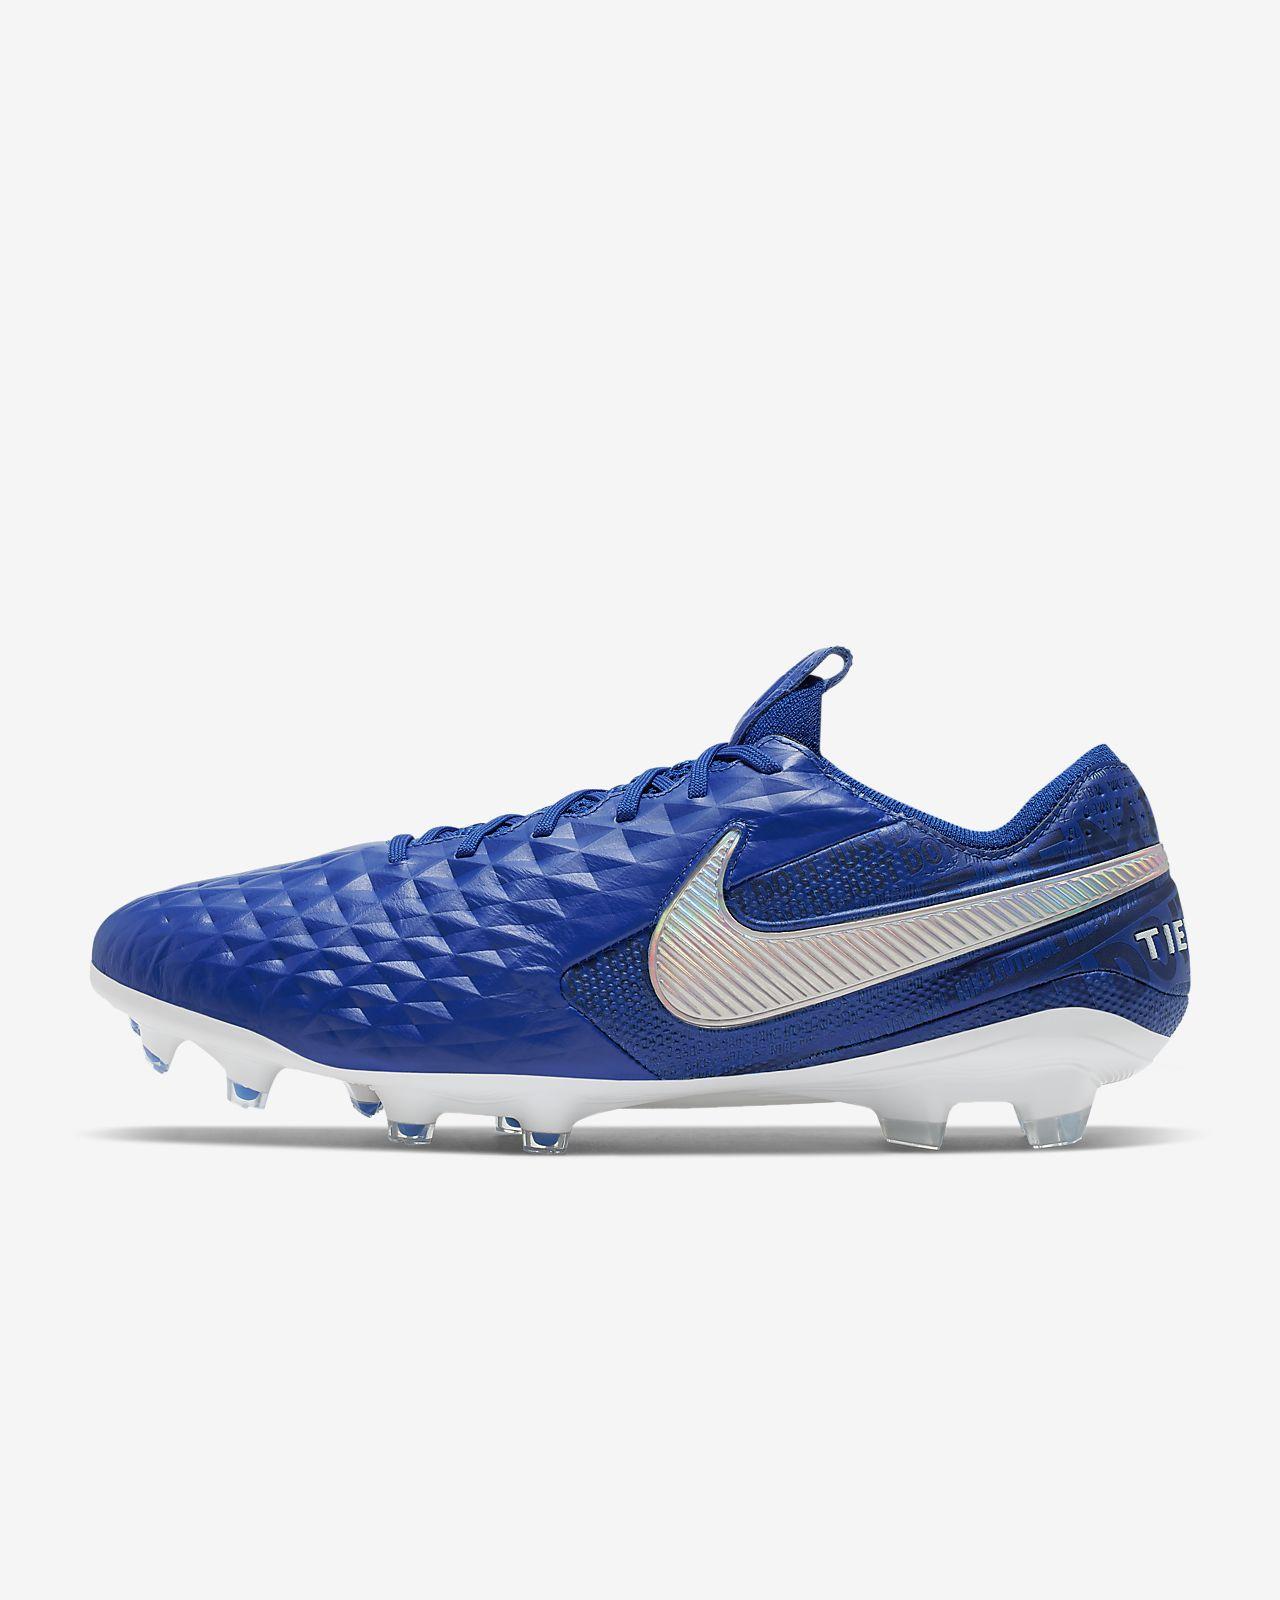 Nike Tiempo Legend 8 Elite FG Firm-Ground Soccer Cleat